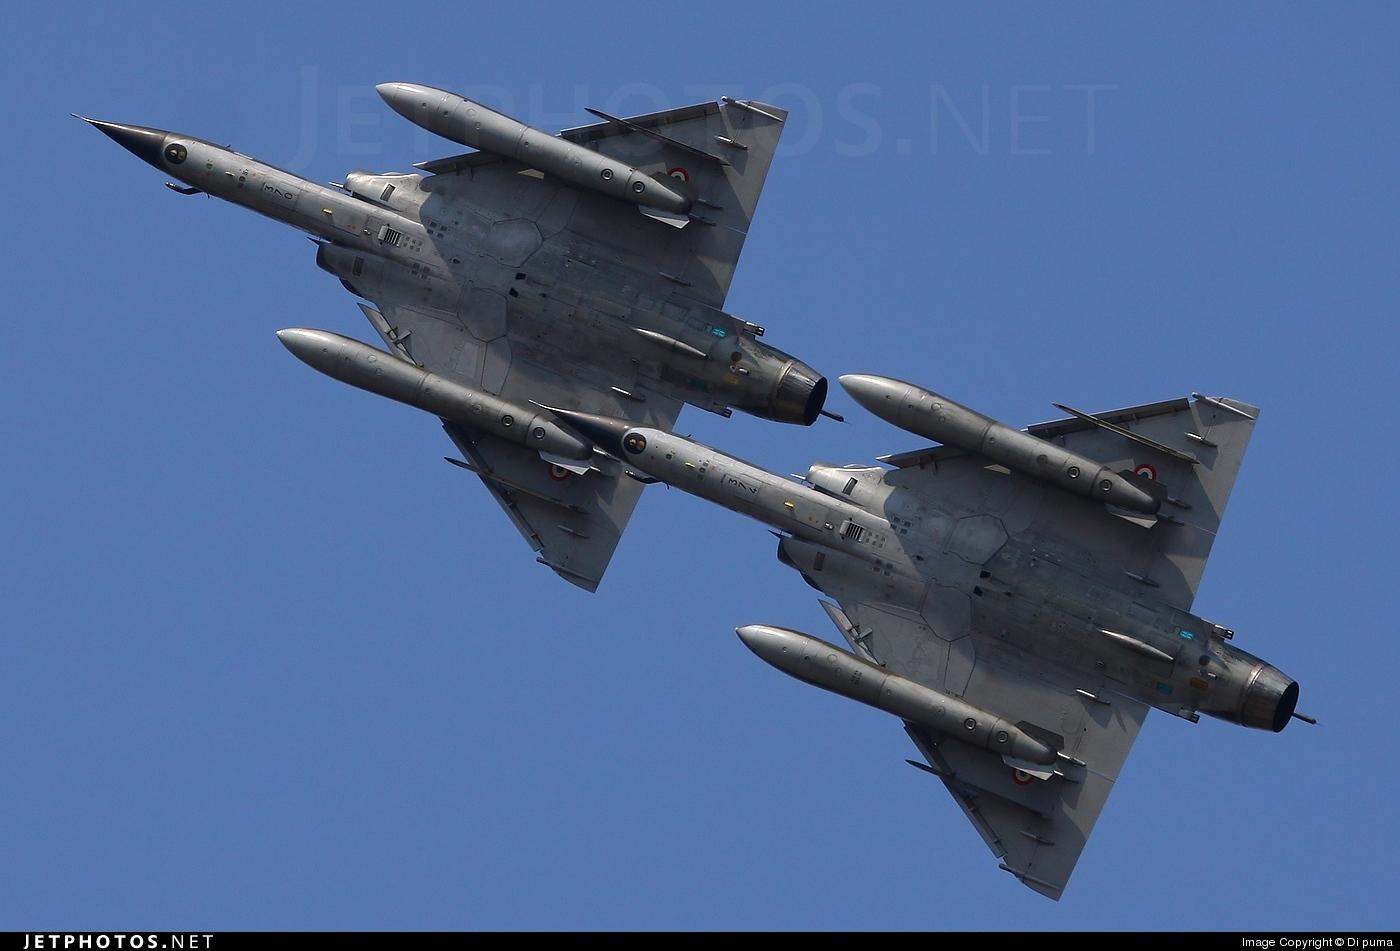 370 - Dassault Mirage 2000 - France - Air Force